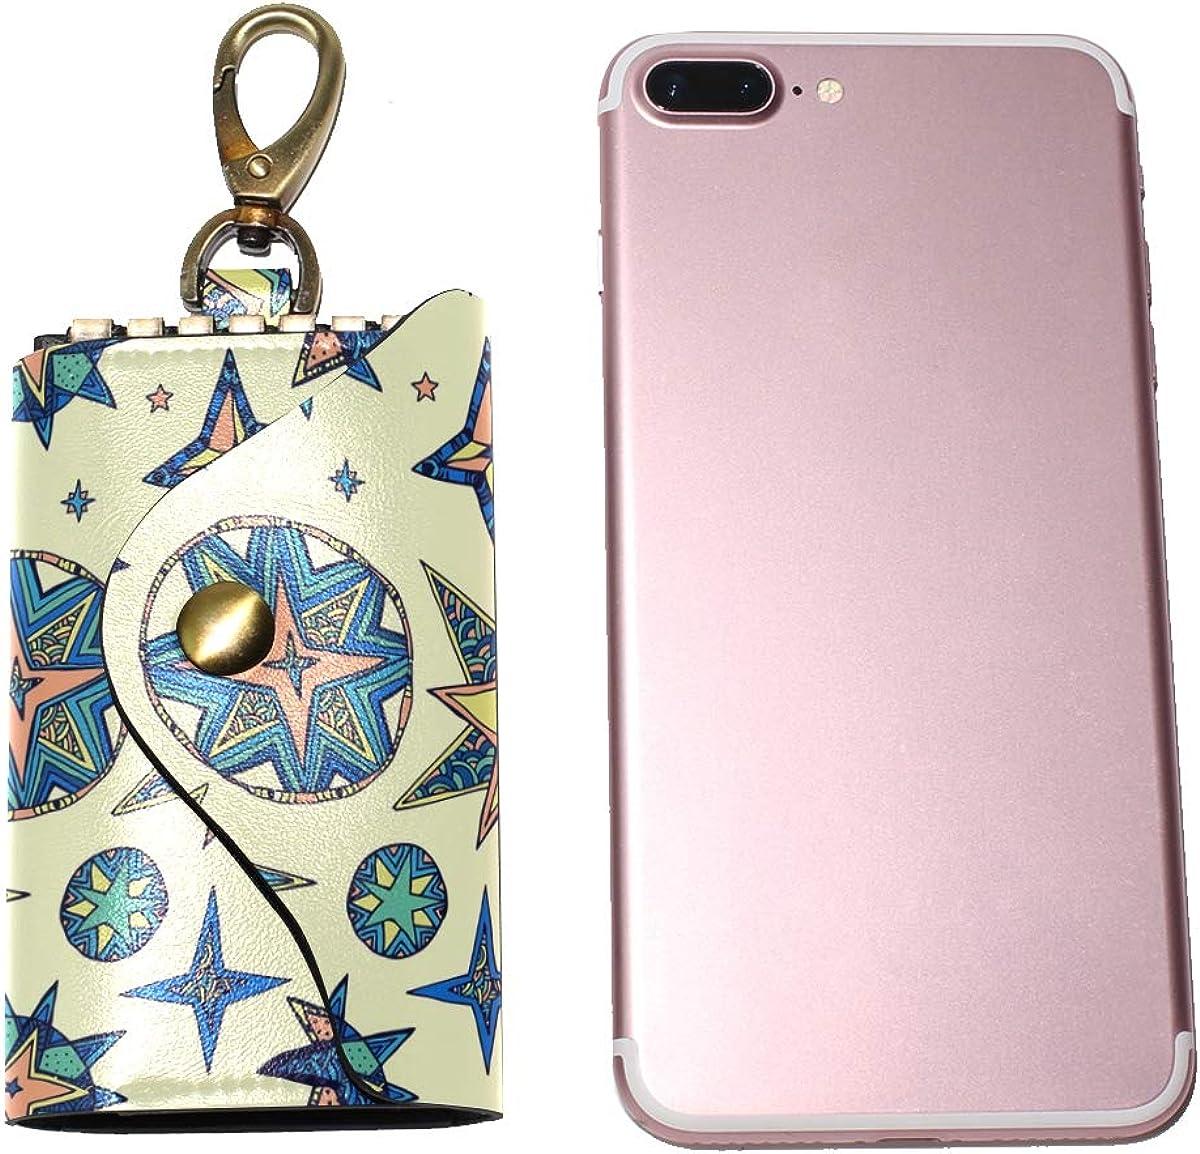 KEAKIA Fantasy Starry Sky Leather Key Case Wallets Tri-fold Key Holder Keychains with 6 Hooks 2 Slot Snap Closure for Men Women